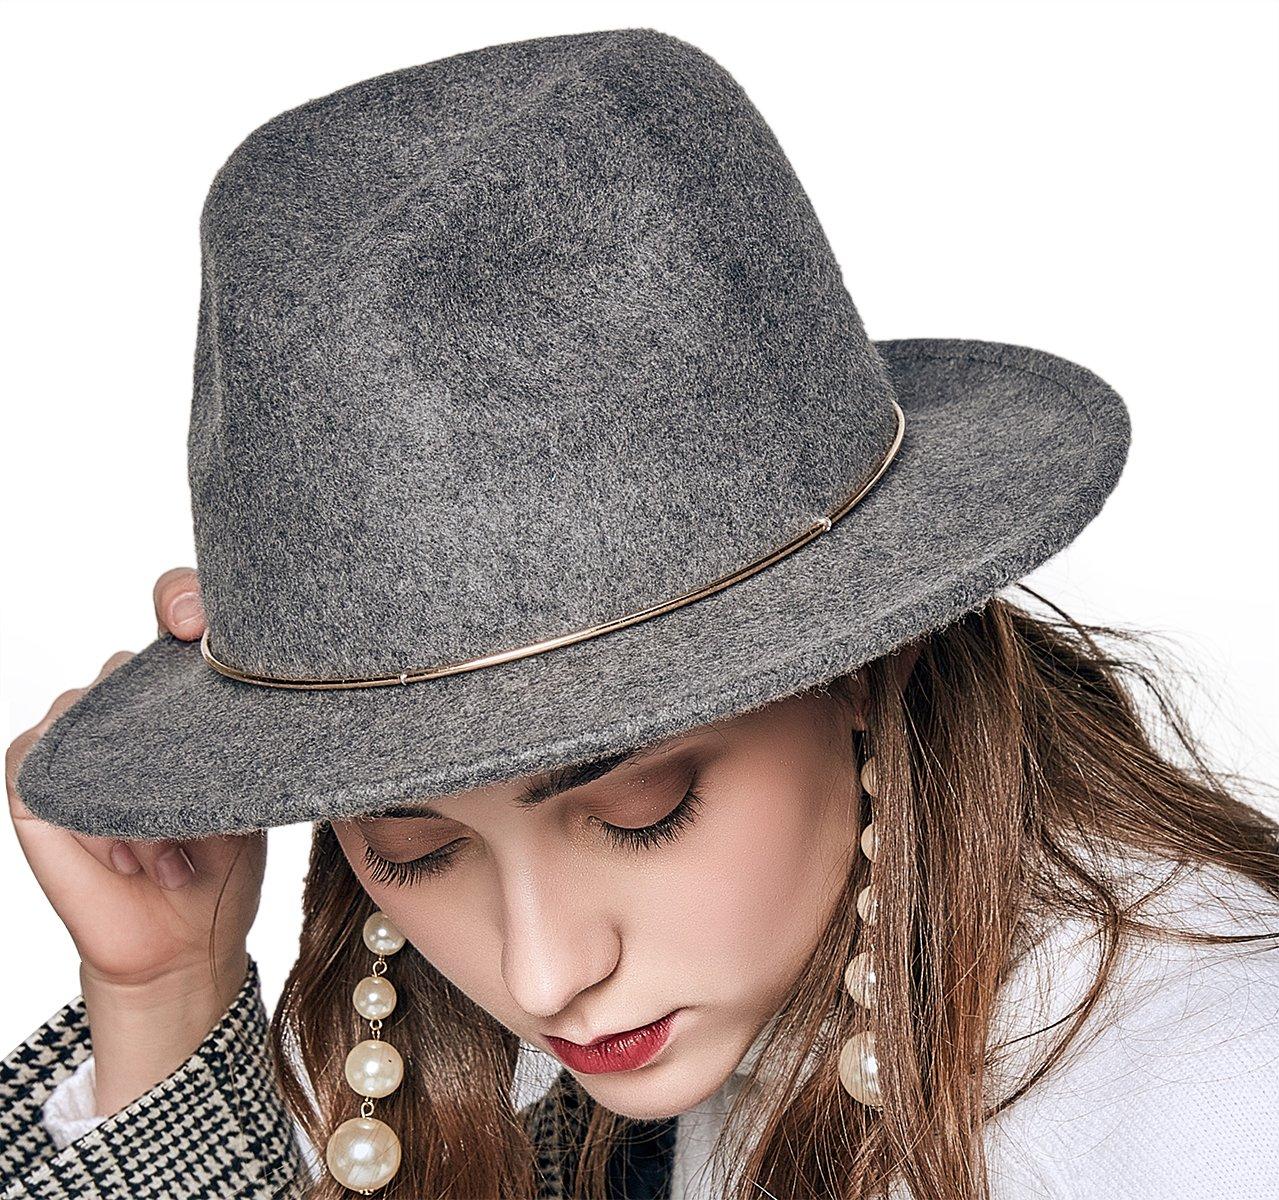 JNINTH Trendy 100% Wool Felt Fedora Hats Wide Brim Comfortable Adjustable Cap with The Unique Metal Circle for Women (Gray)